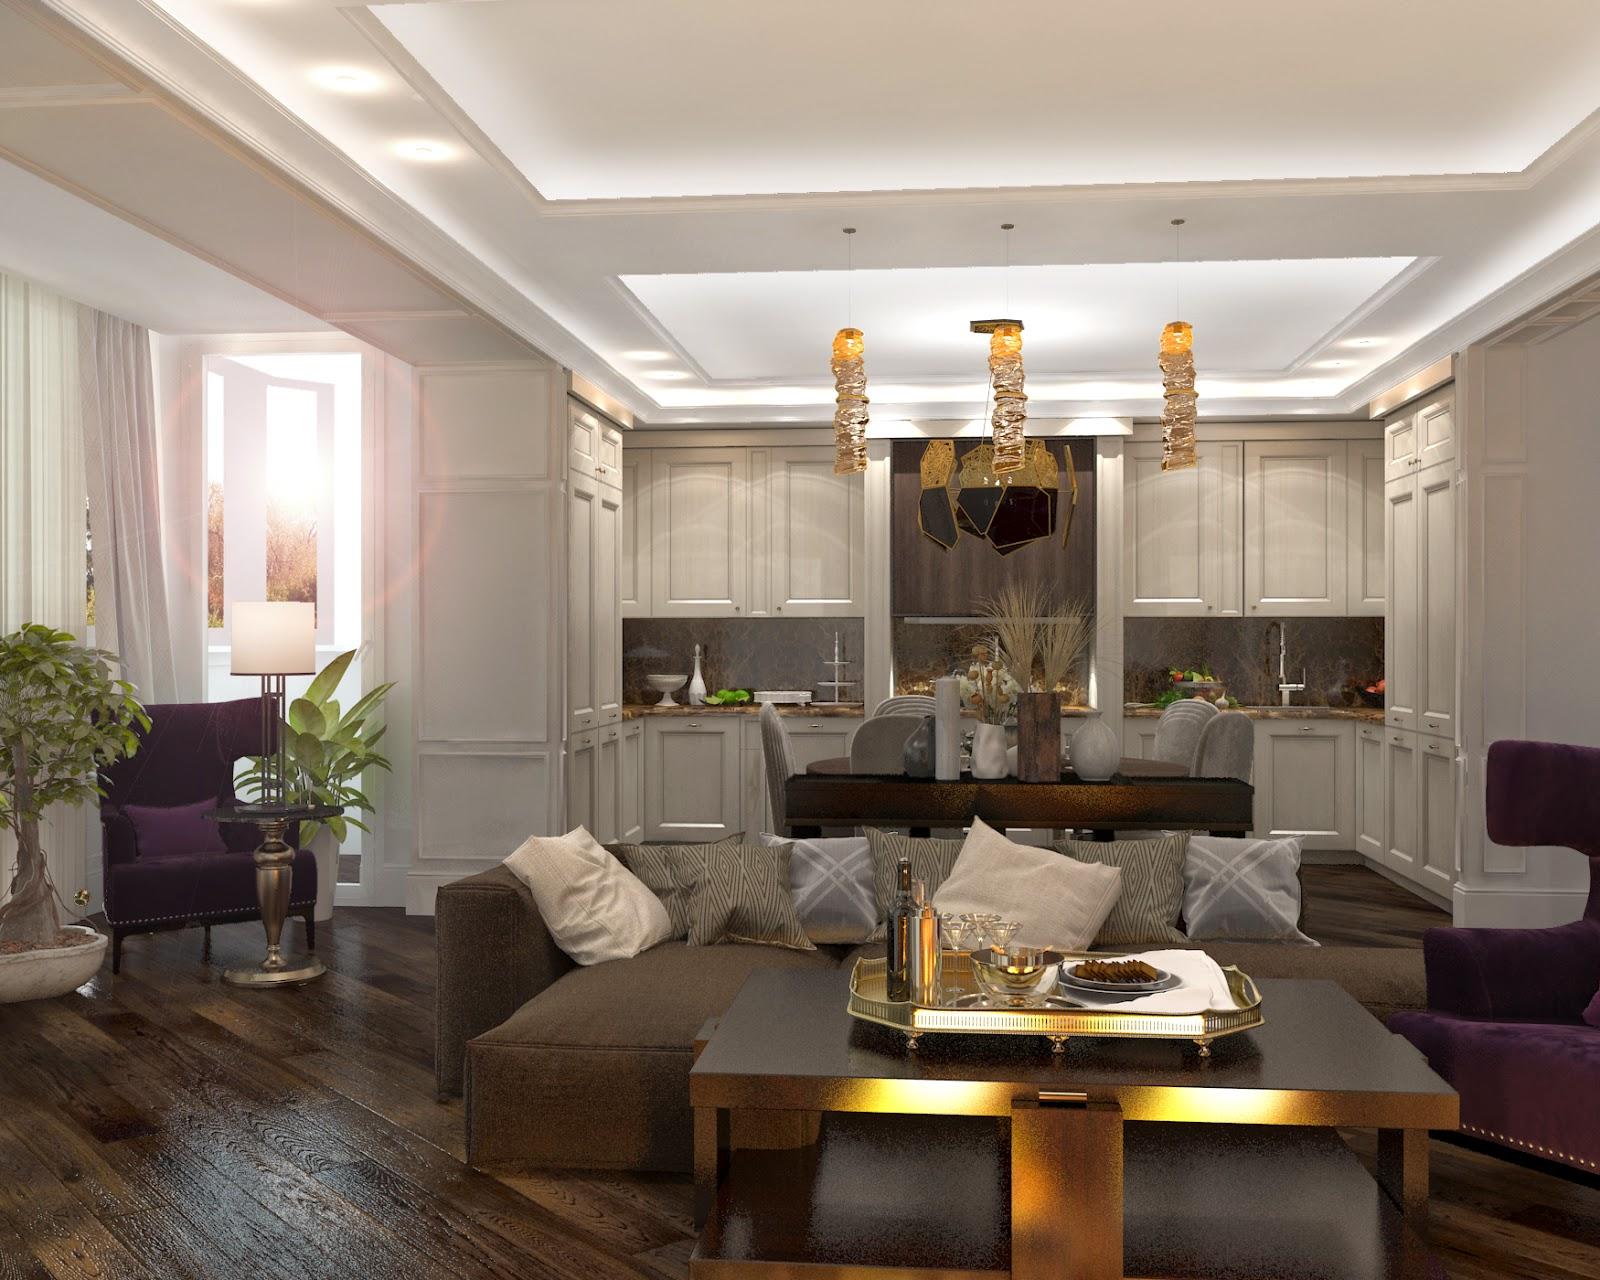 Darya girina interior design march 2015 - Bedroom Darya Girina